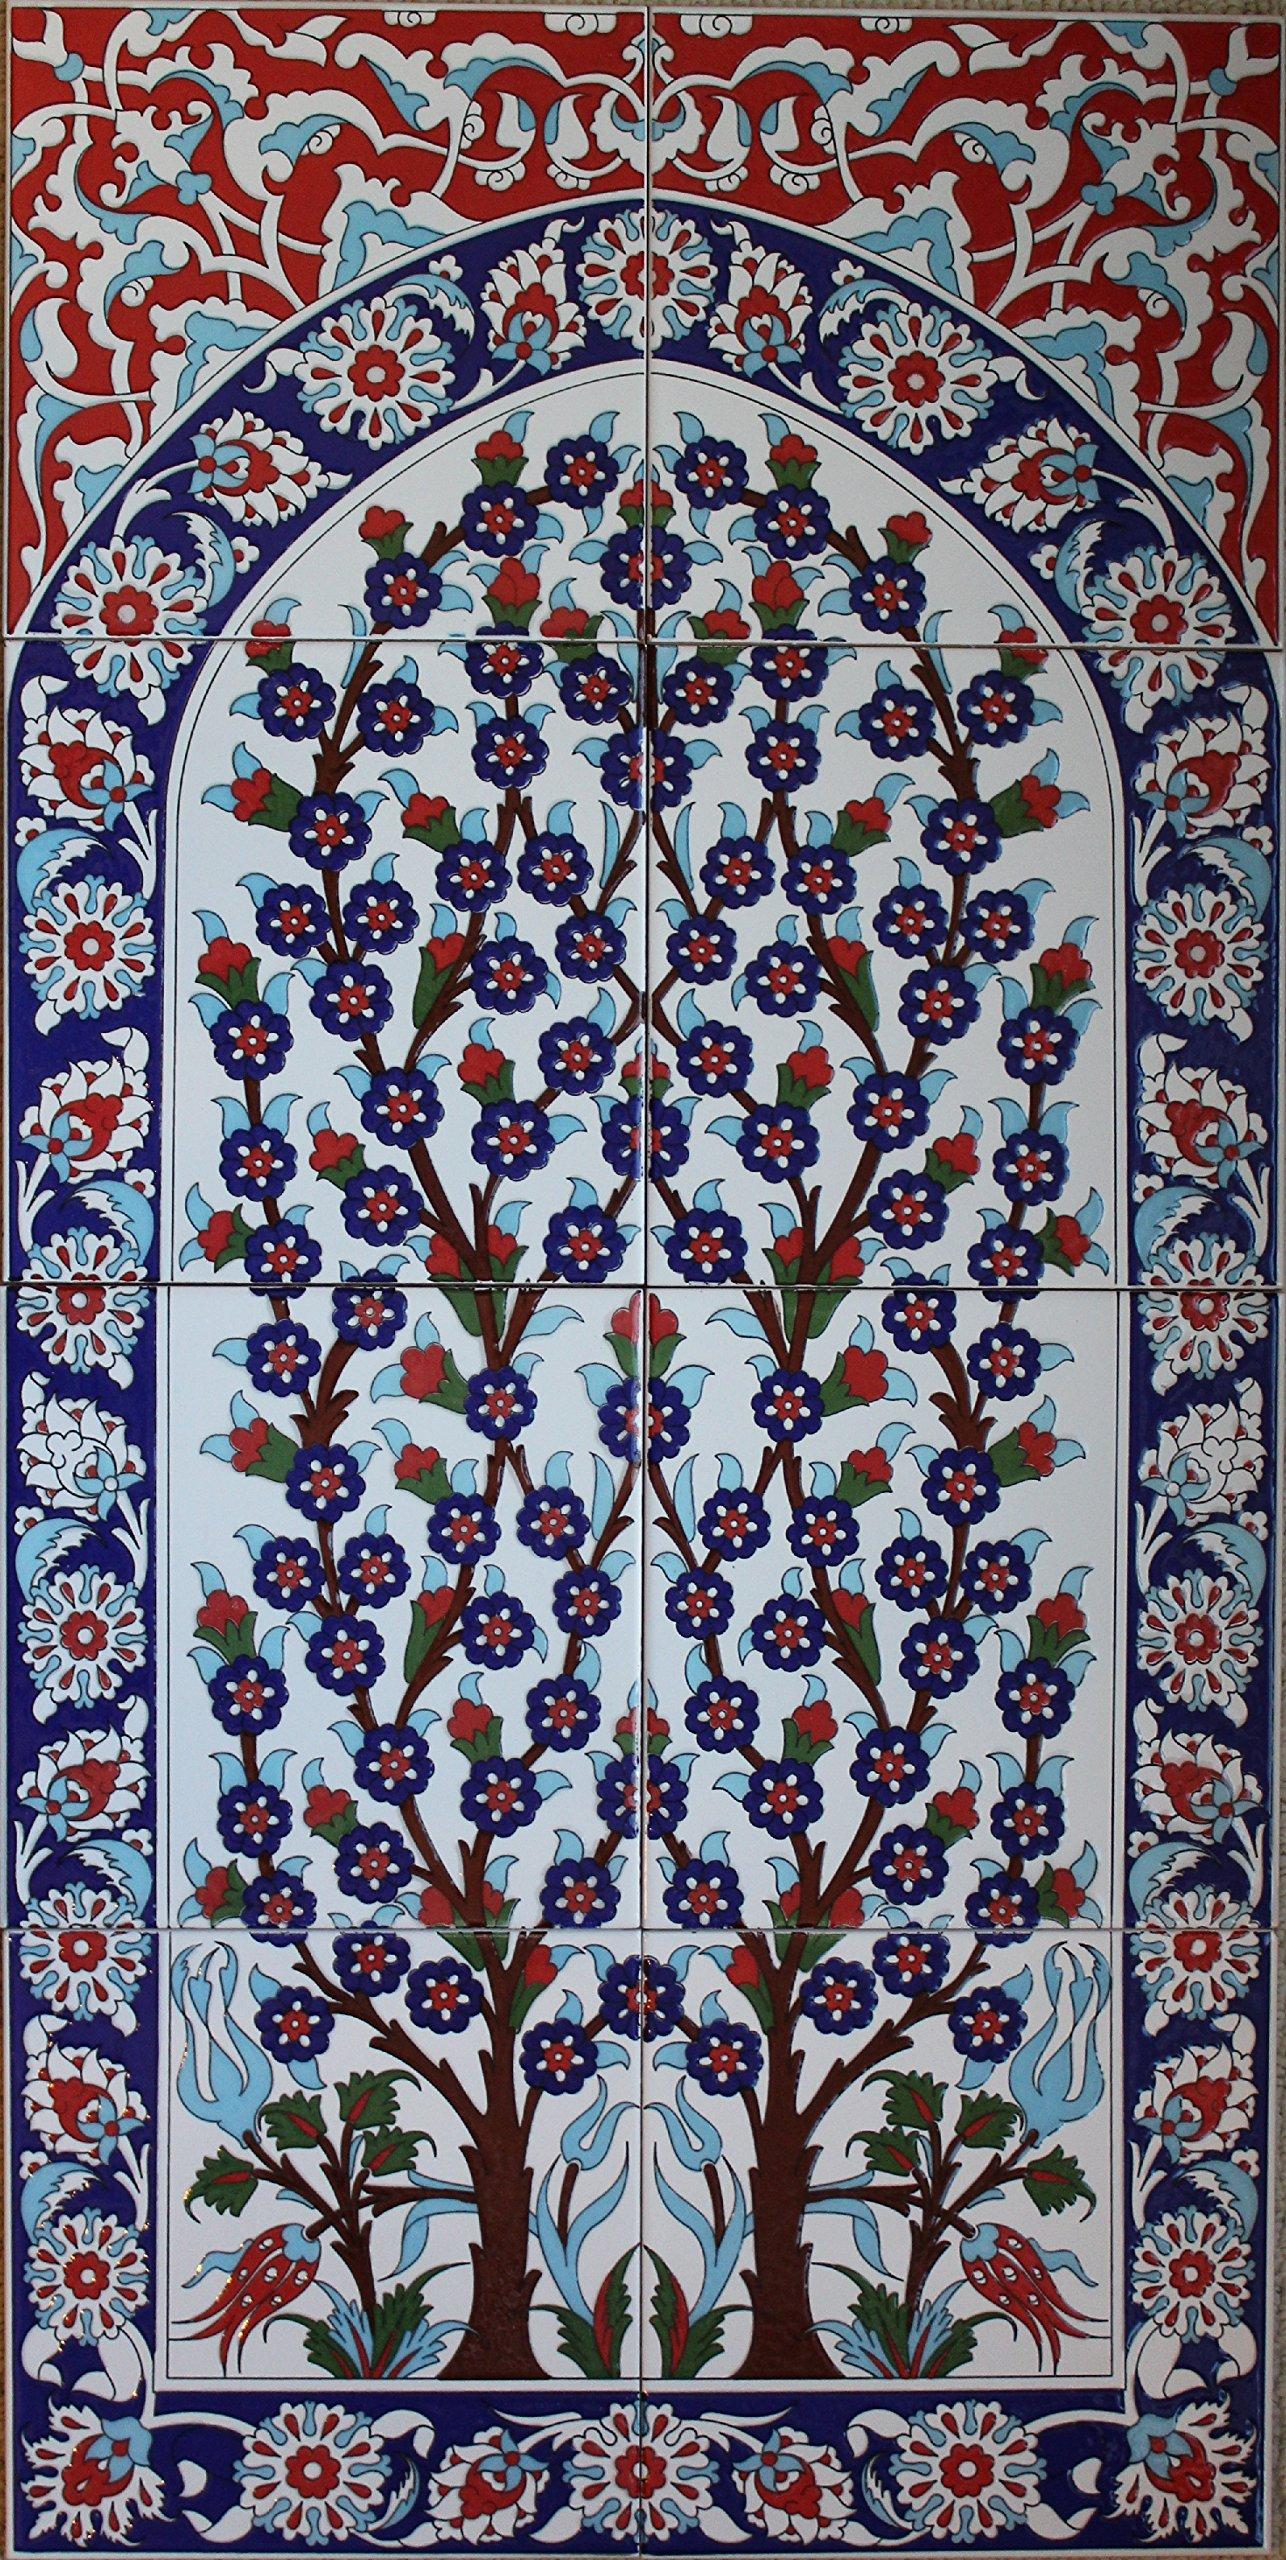 16''x32'' Hand-pianted Turkish Iznik Tree of Life Pattern Ceramic Tile Mural Panel